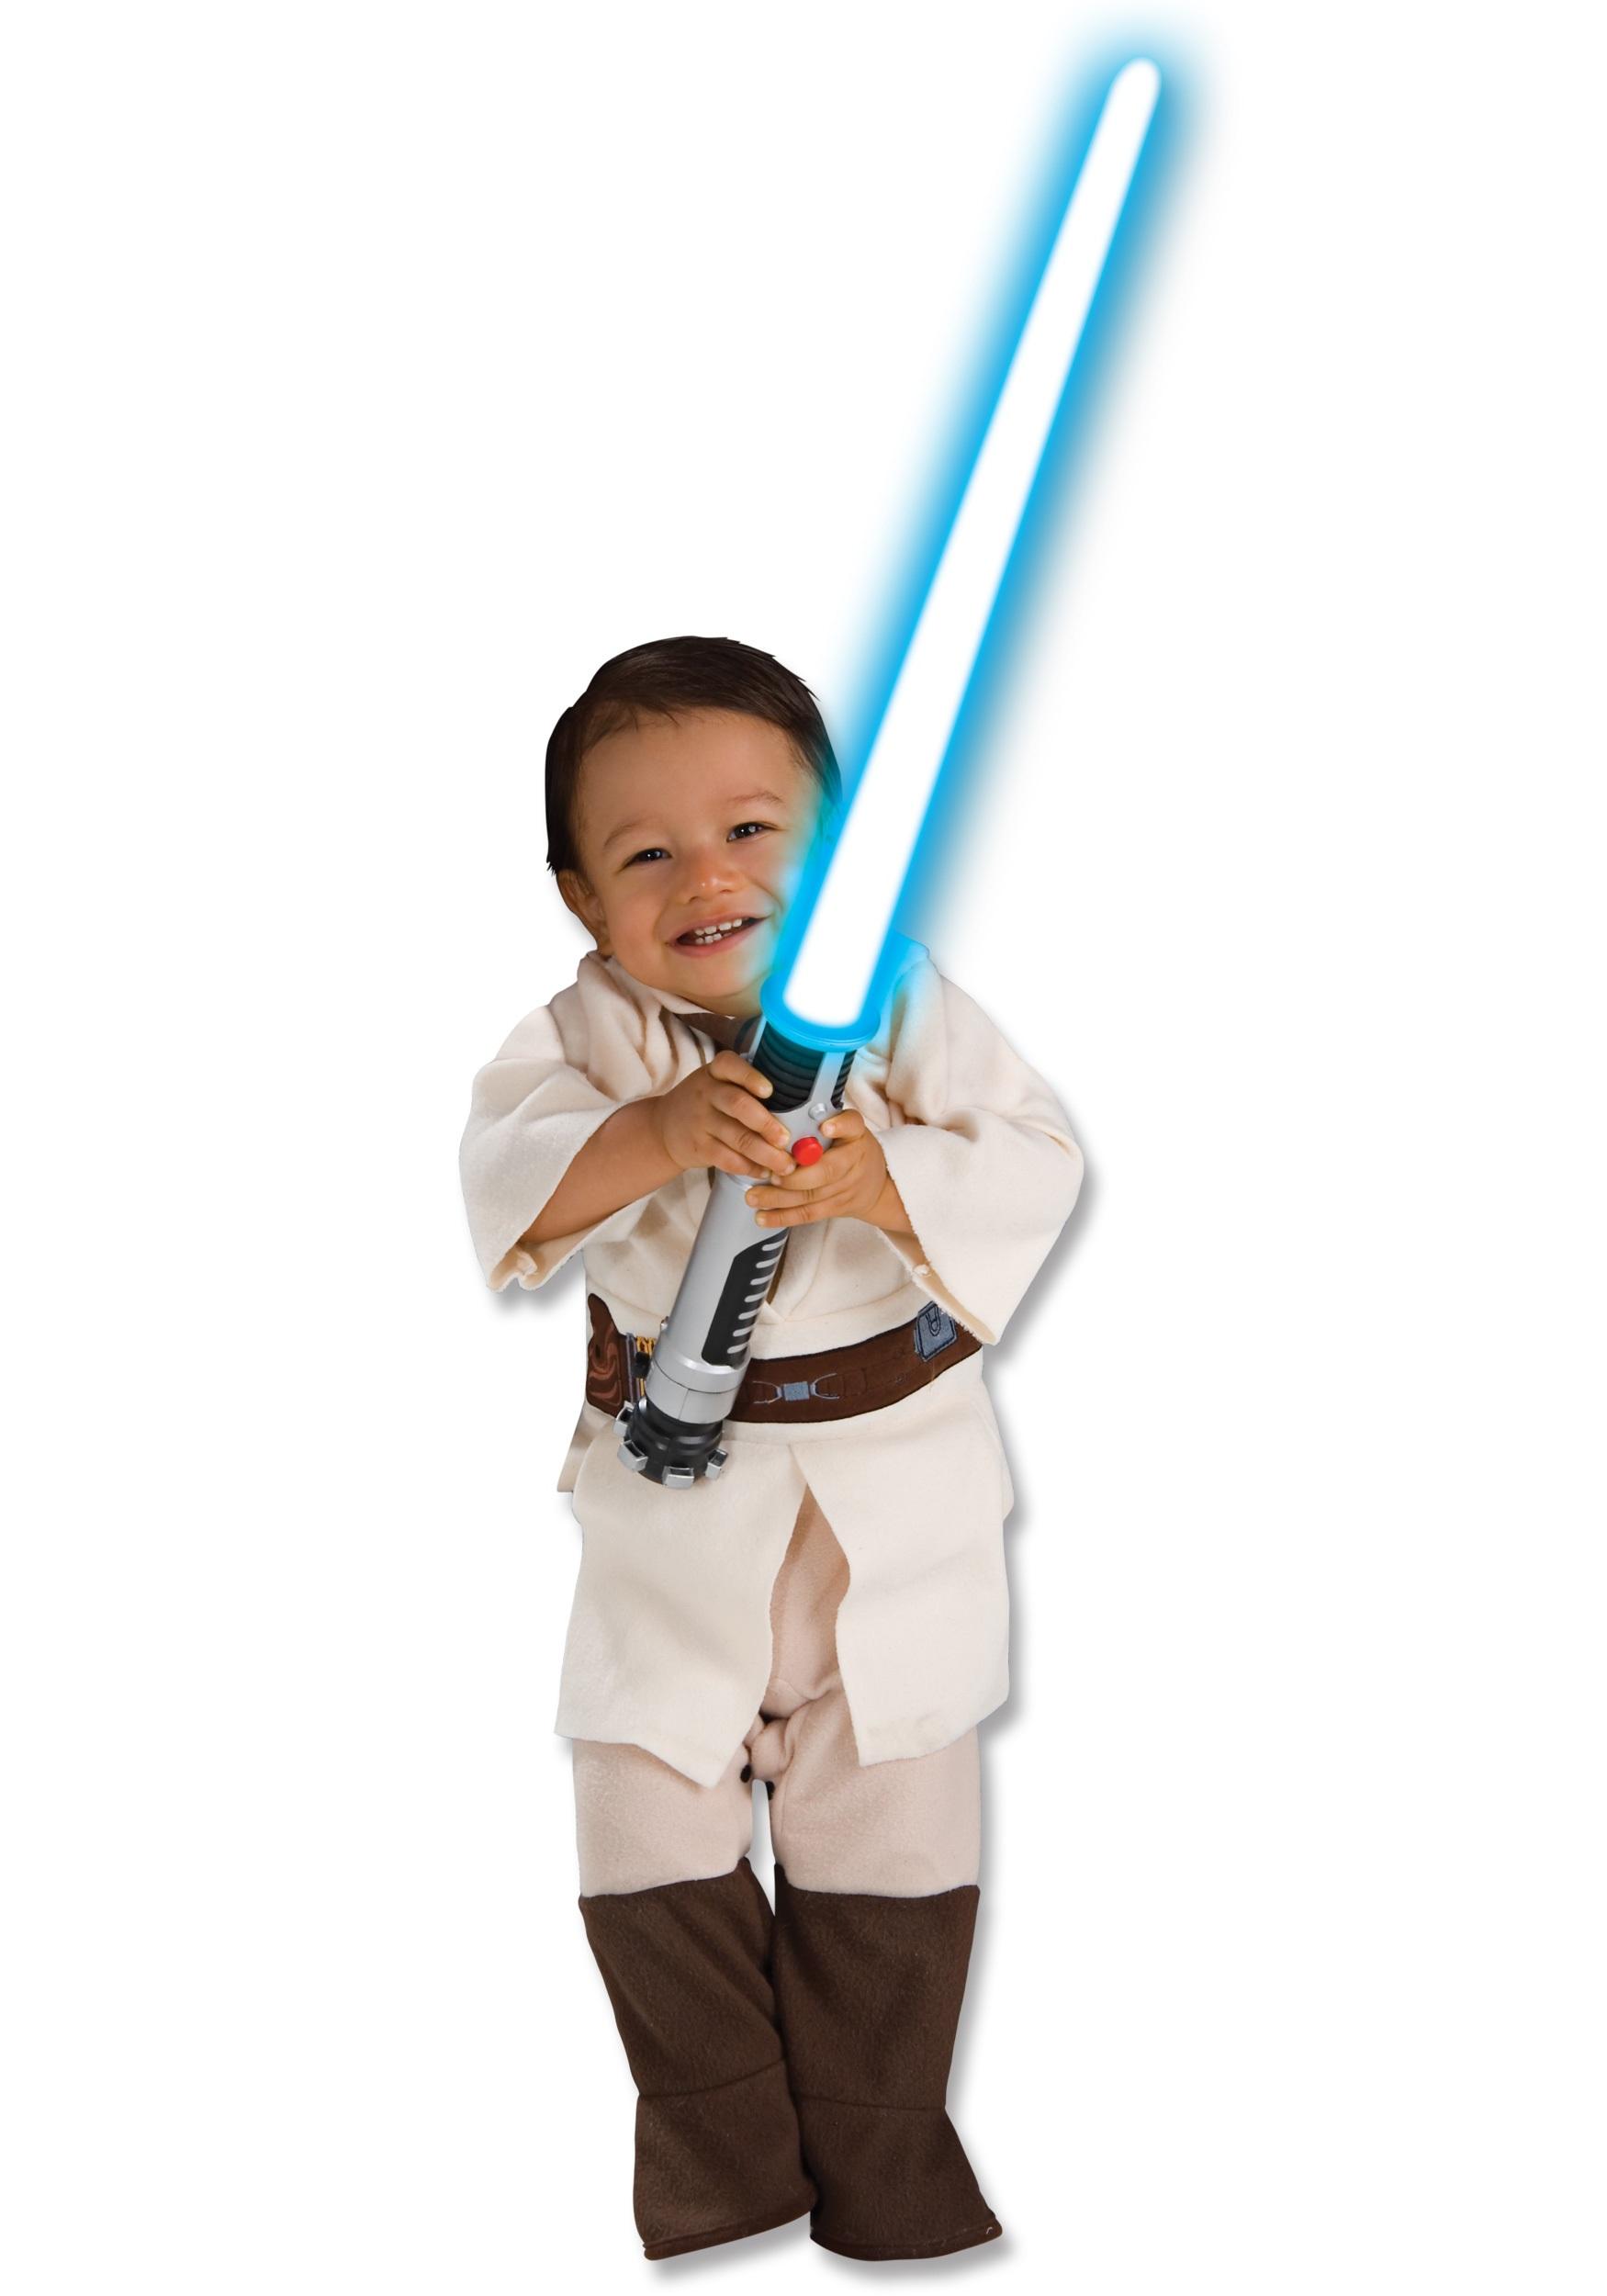 obi wan kenobi costumes child kids star wars halloween